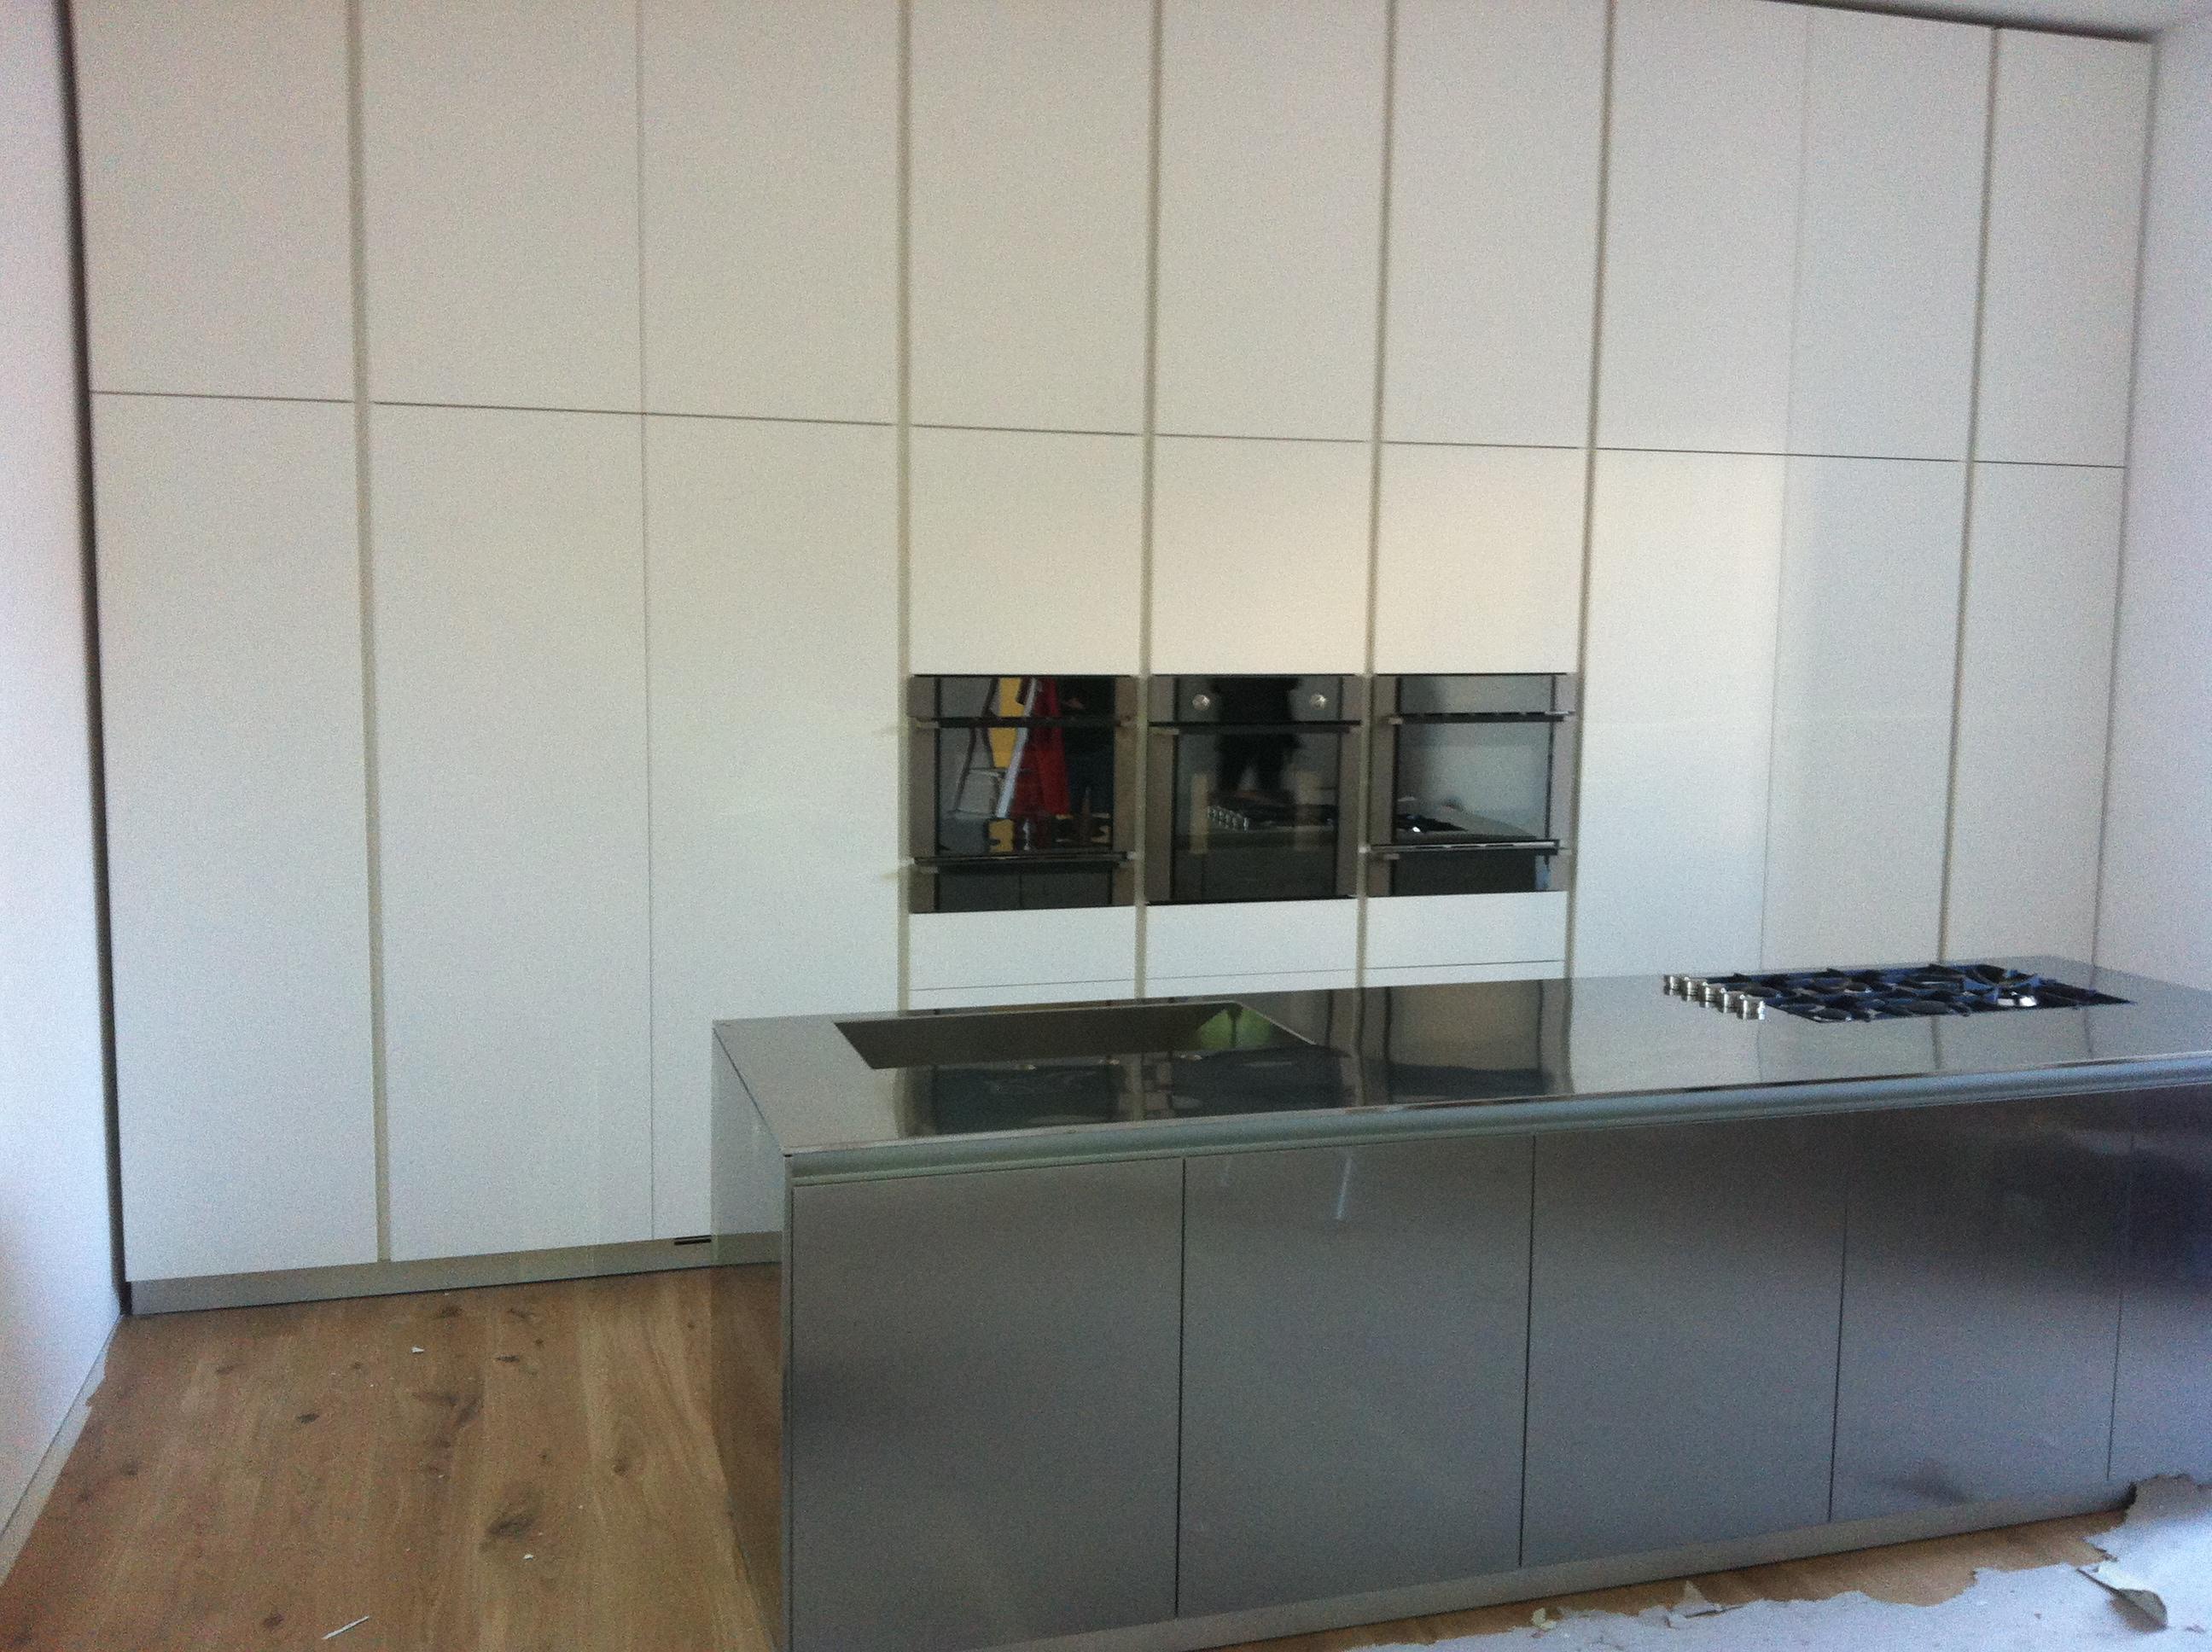 Cucine varenna cucina moderna cucine moderne arredamento - Cucine in linea moderne ...